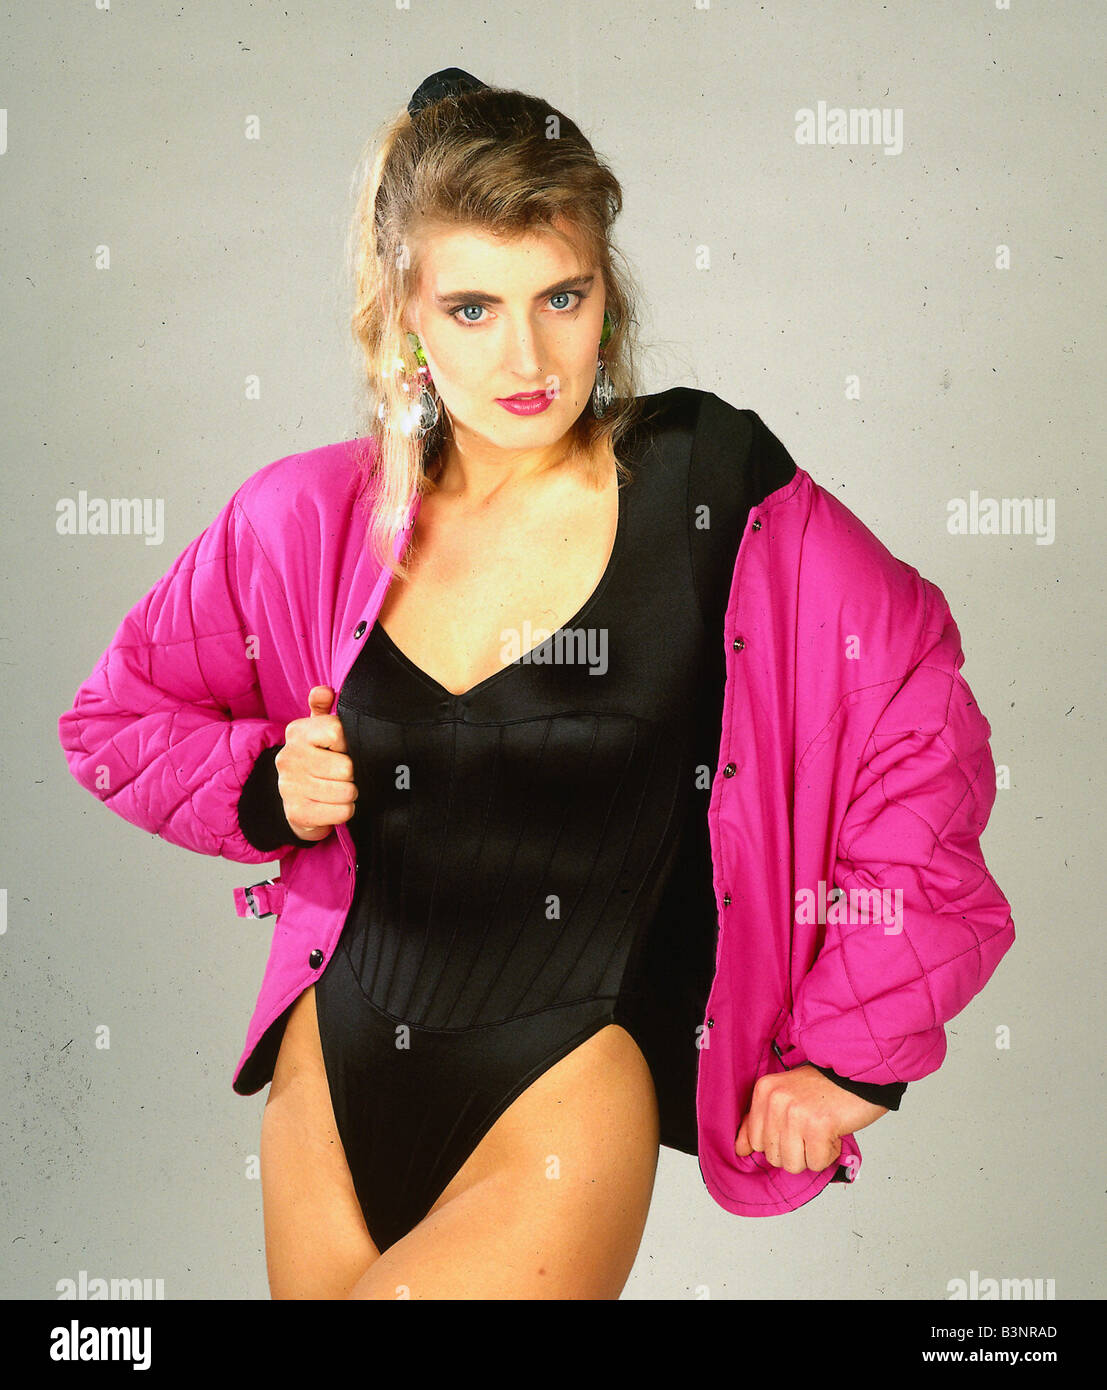 1bc086051 Bodysuit Leotard Stock Photos   Bodysuit Leotard Stock Images - Alamy